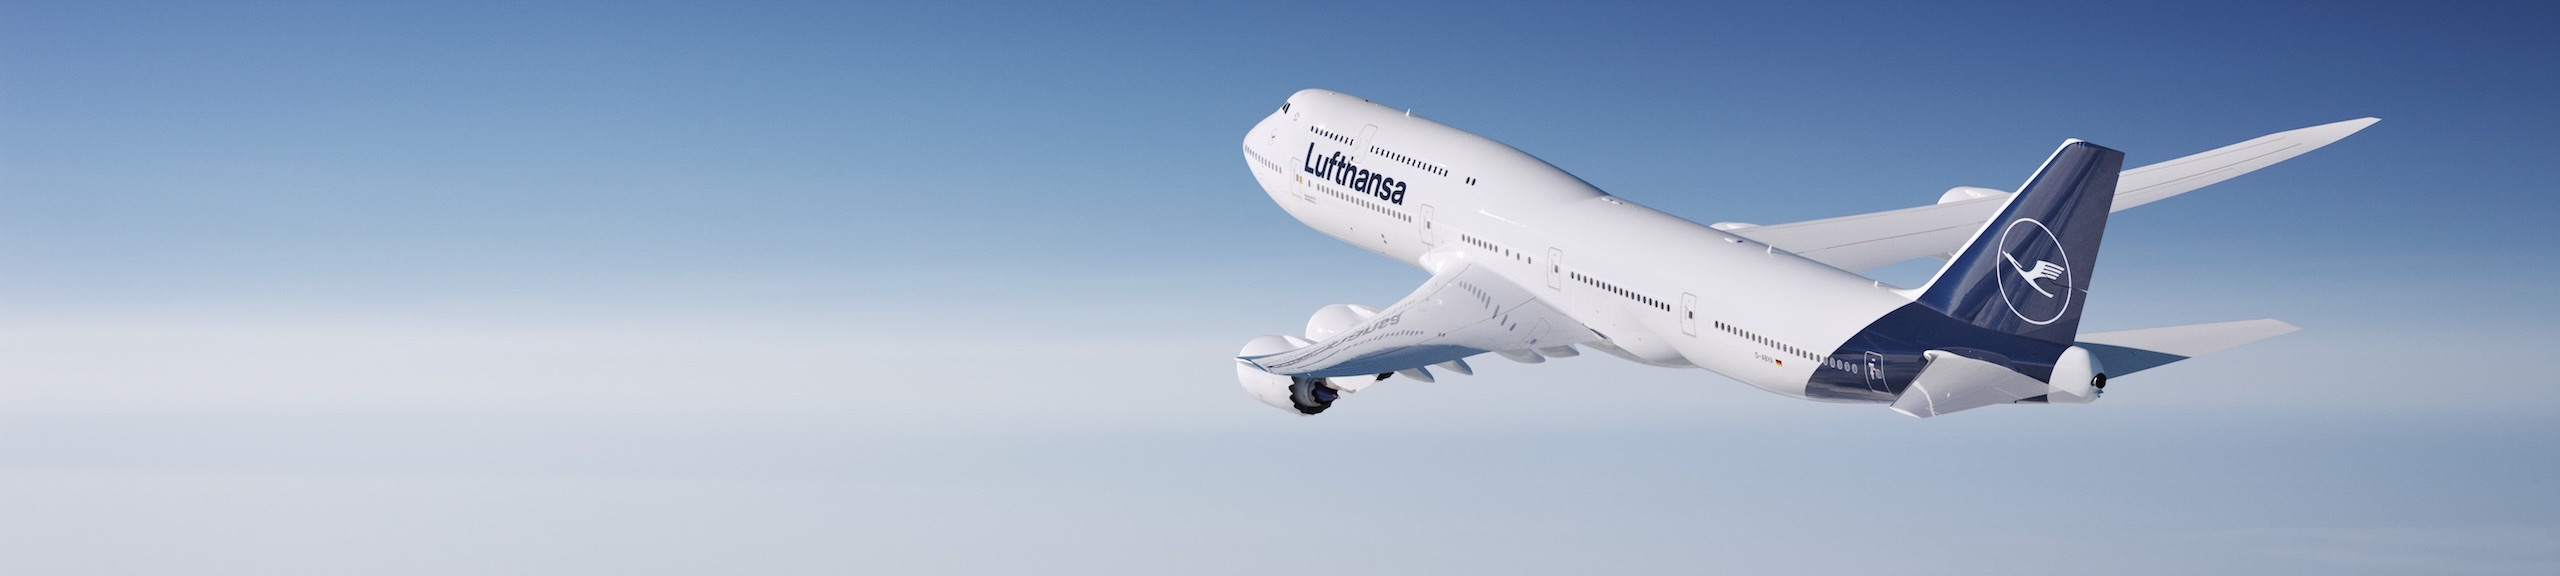 Lufthansa Developer Center - Lufthansa Open API